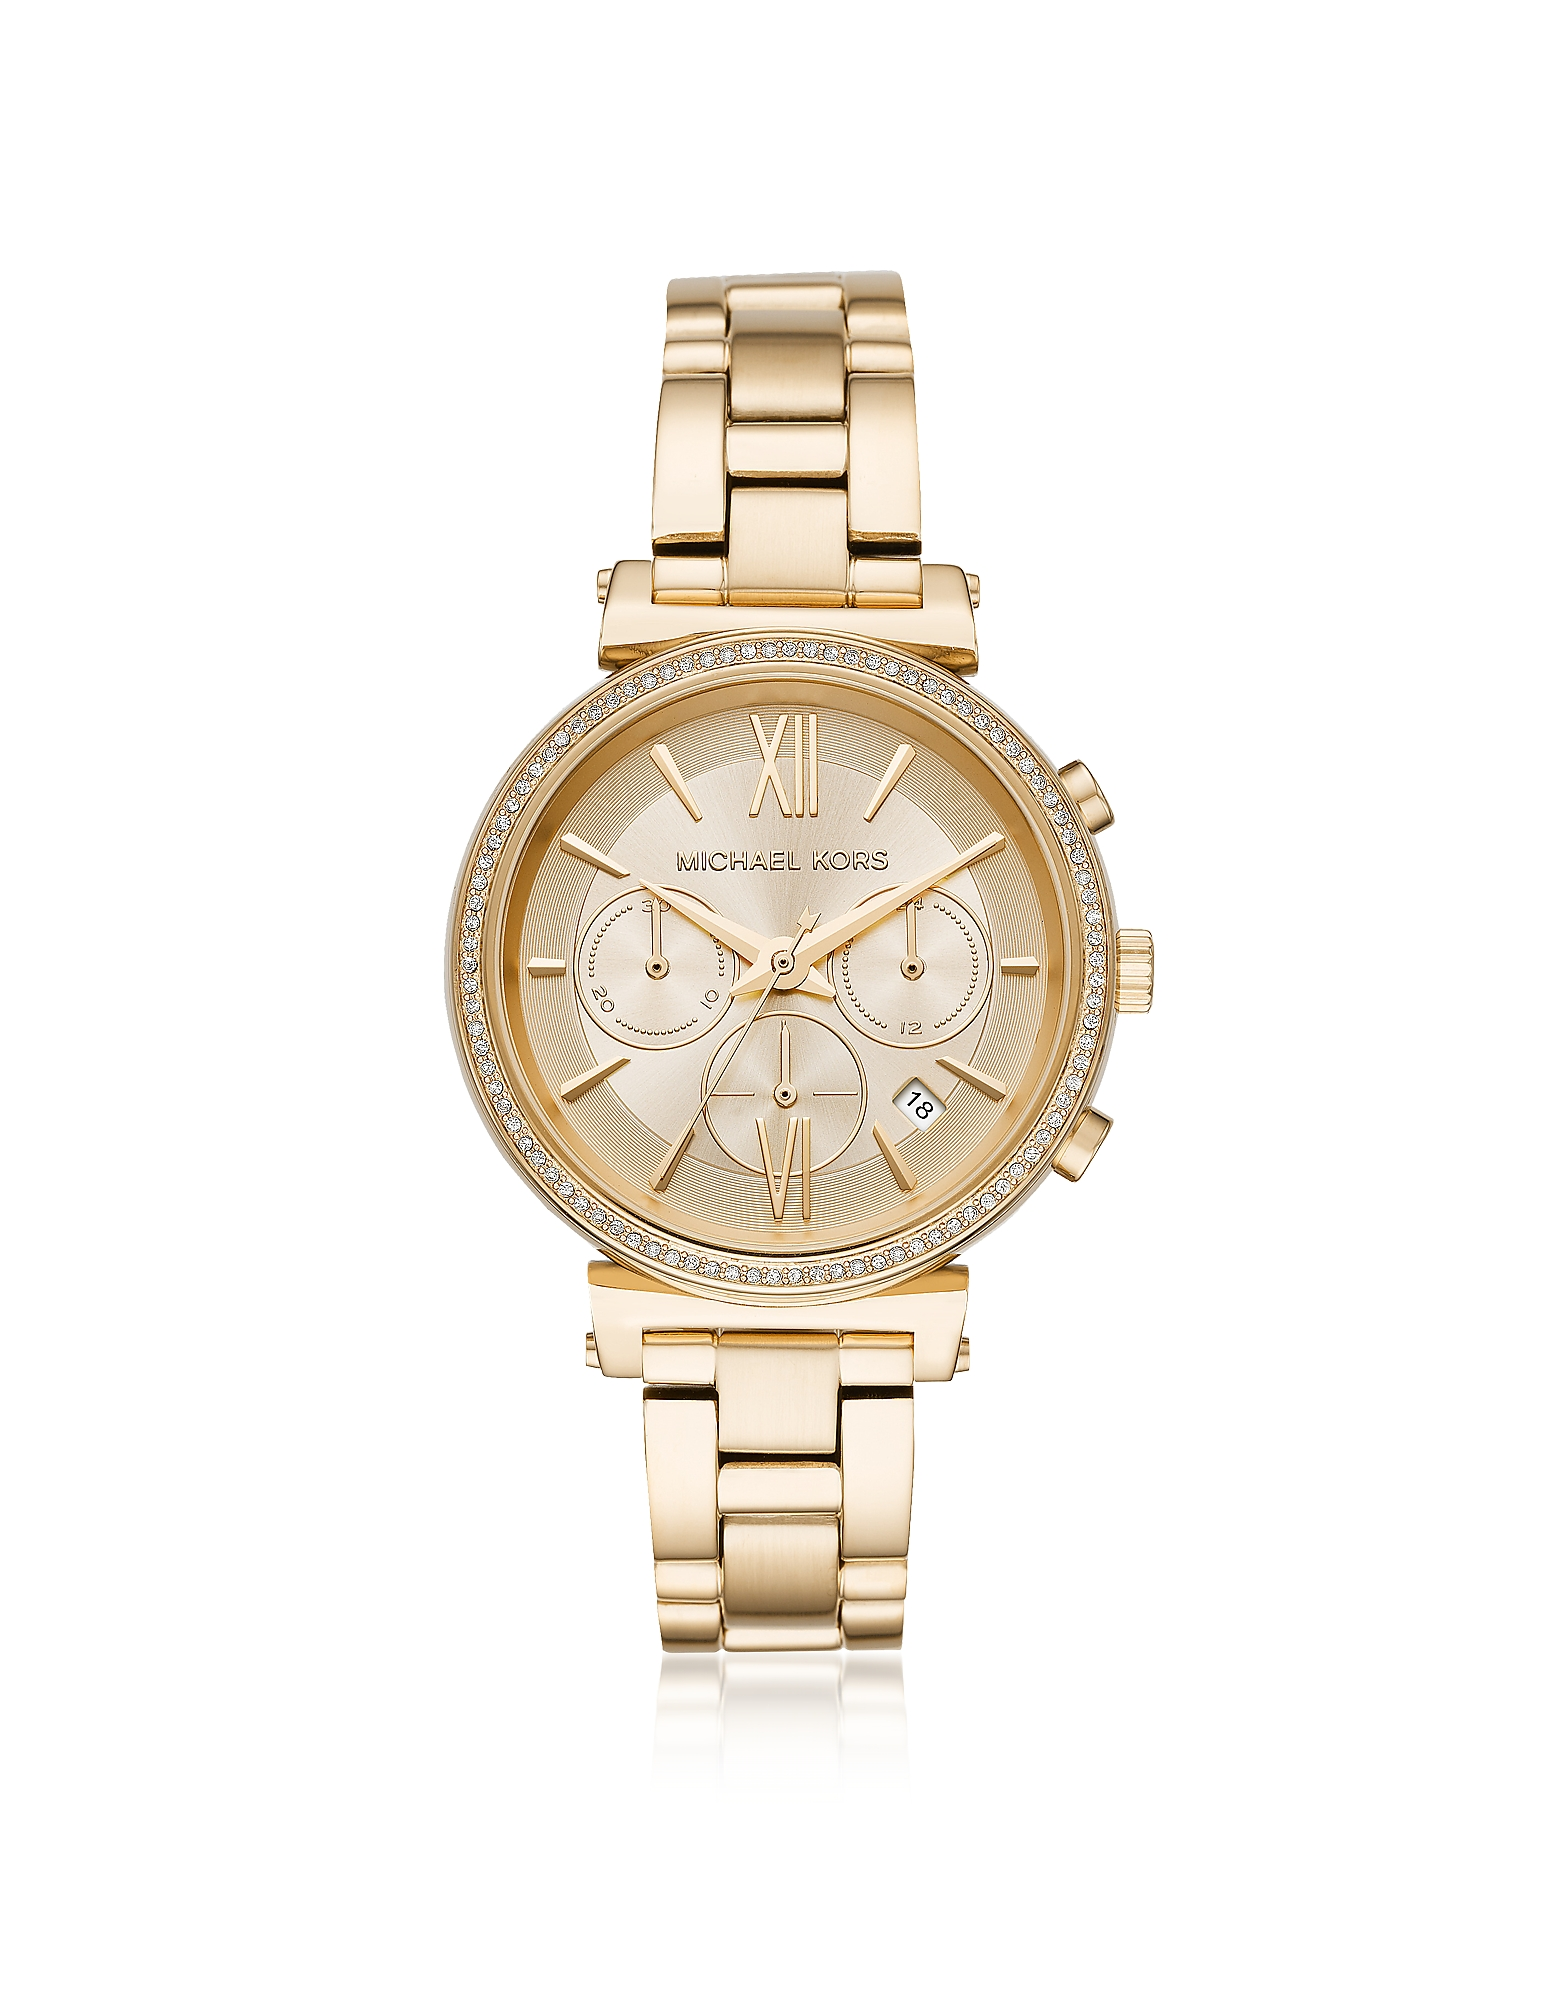 Michael Kors Women's Watches, Sofie Pavé Gold-Tone Women's Watch